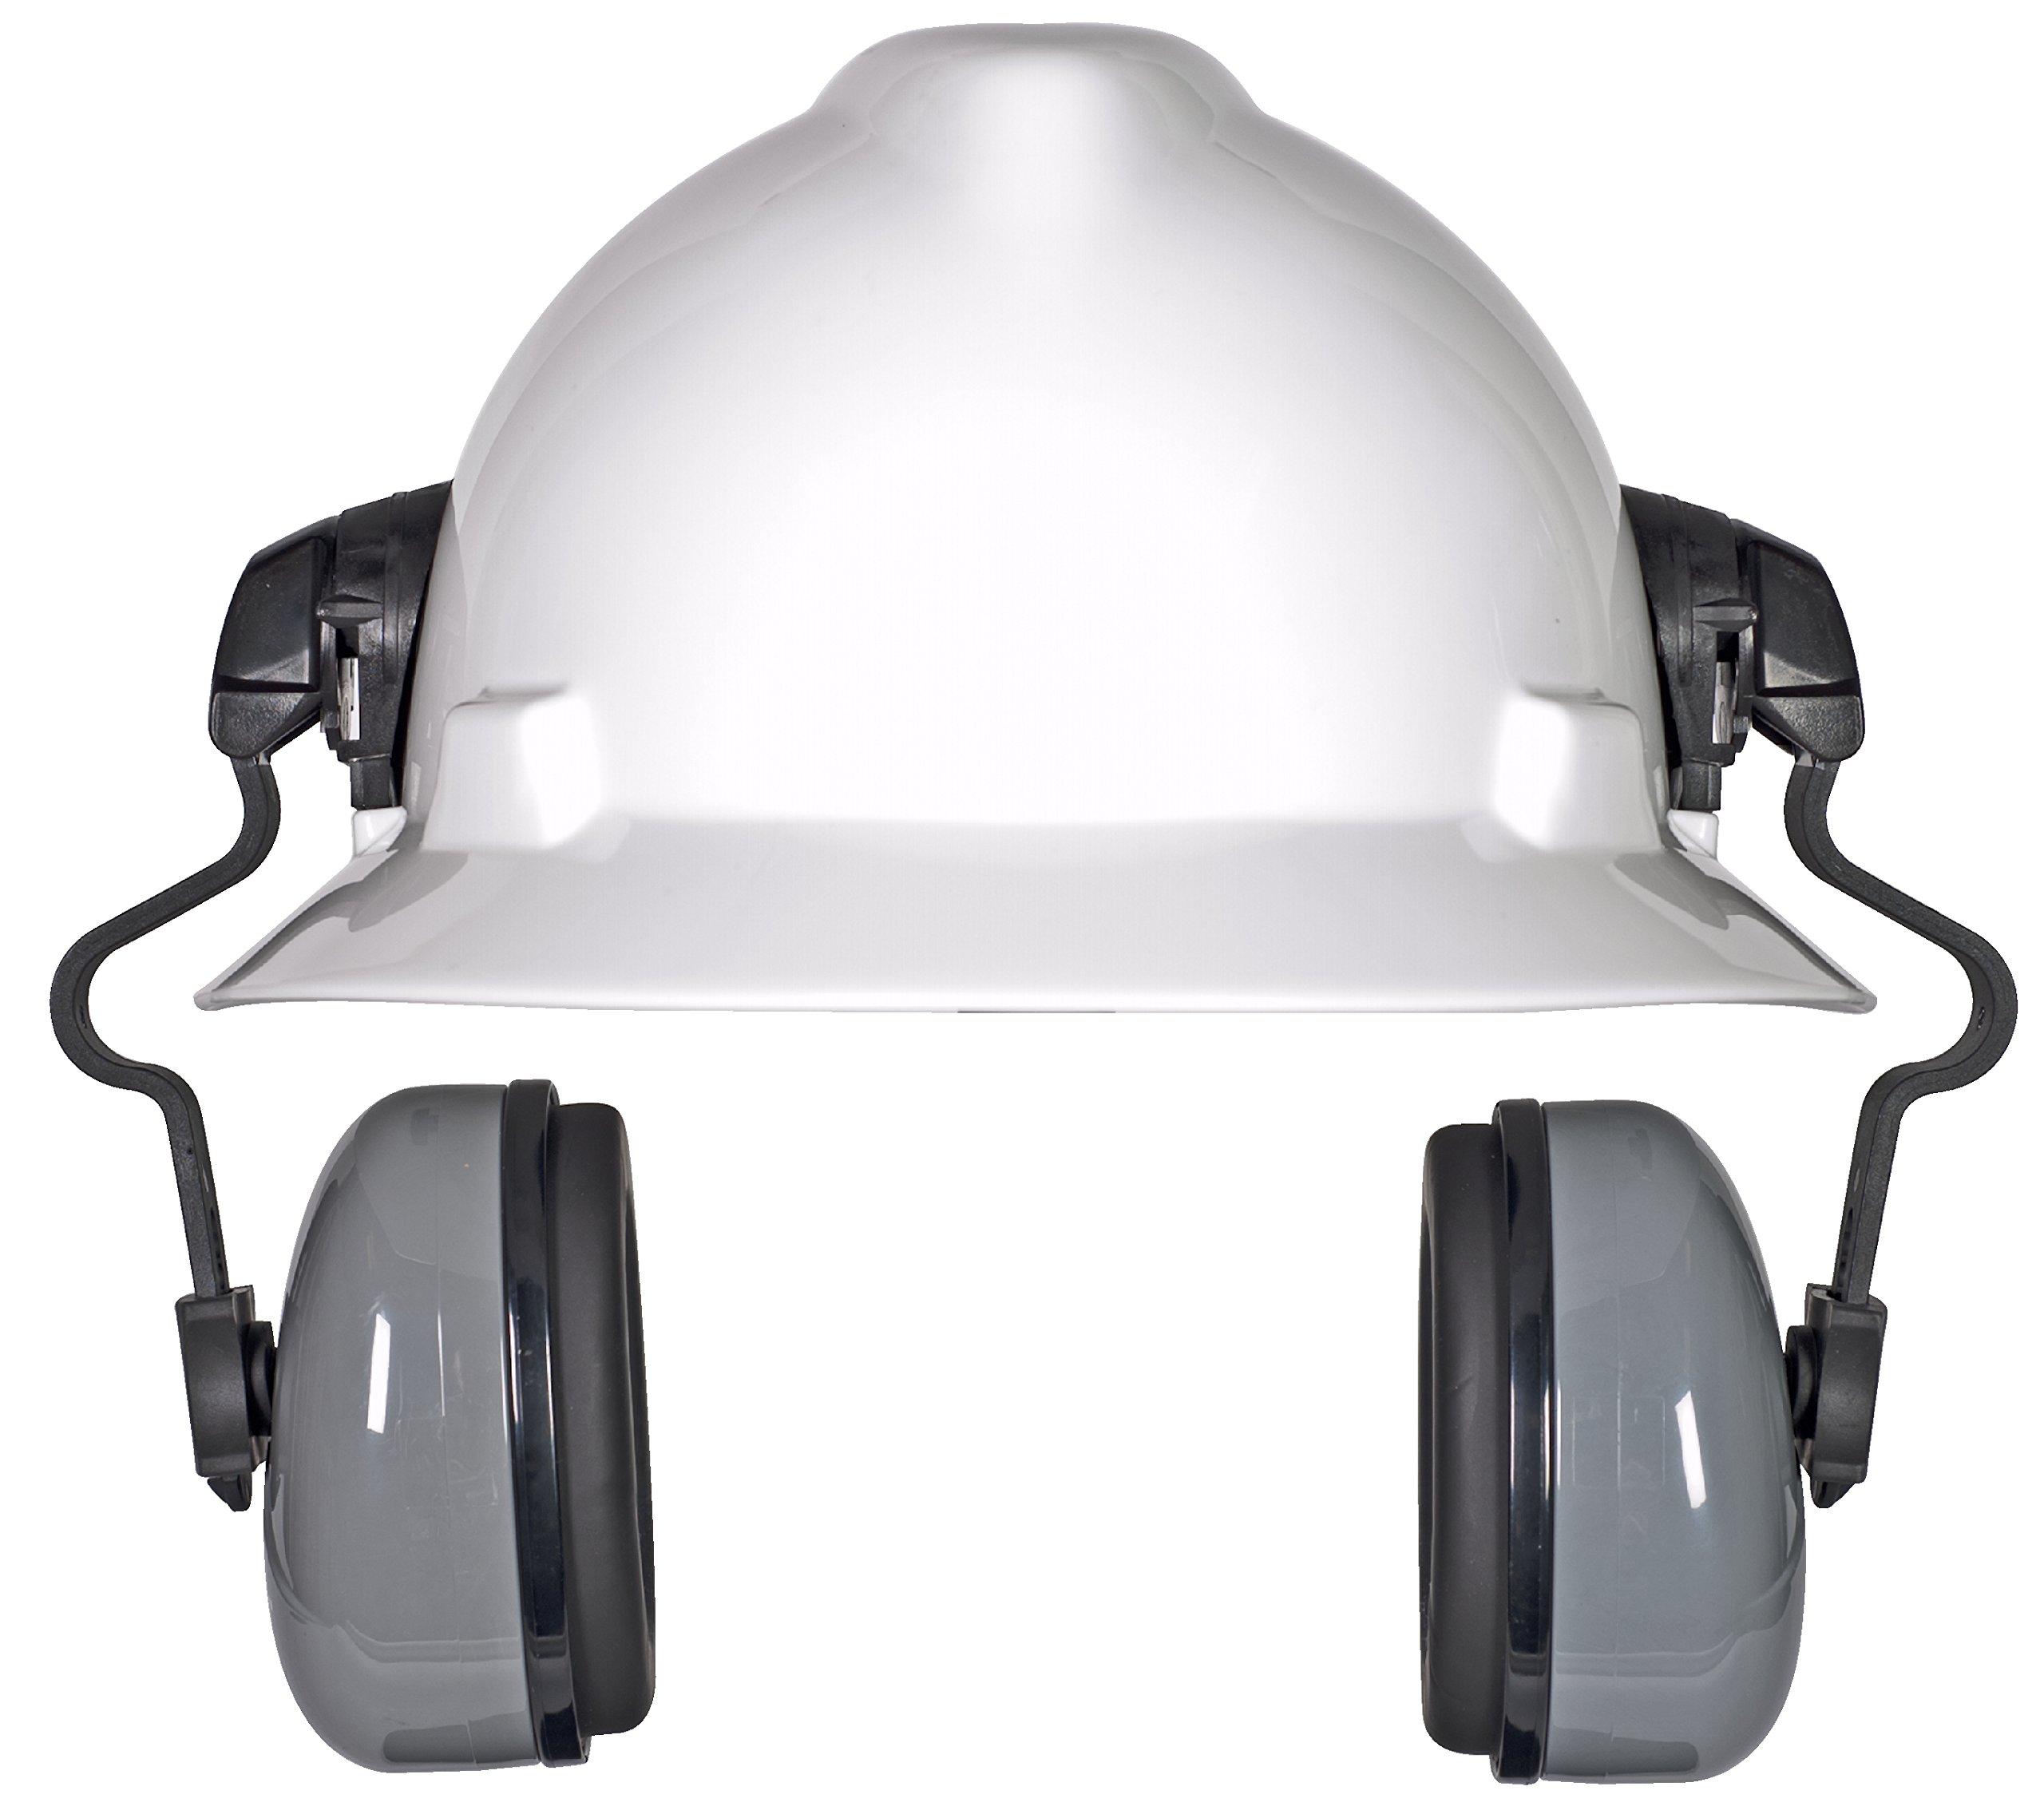 MSA 10129327 SoundControl SH Earmuff, 25 dBA by MSA